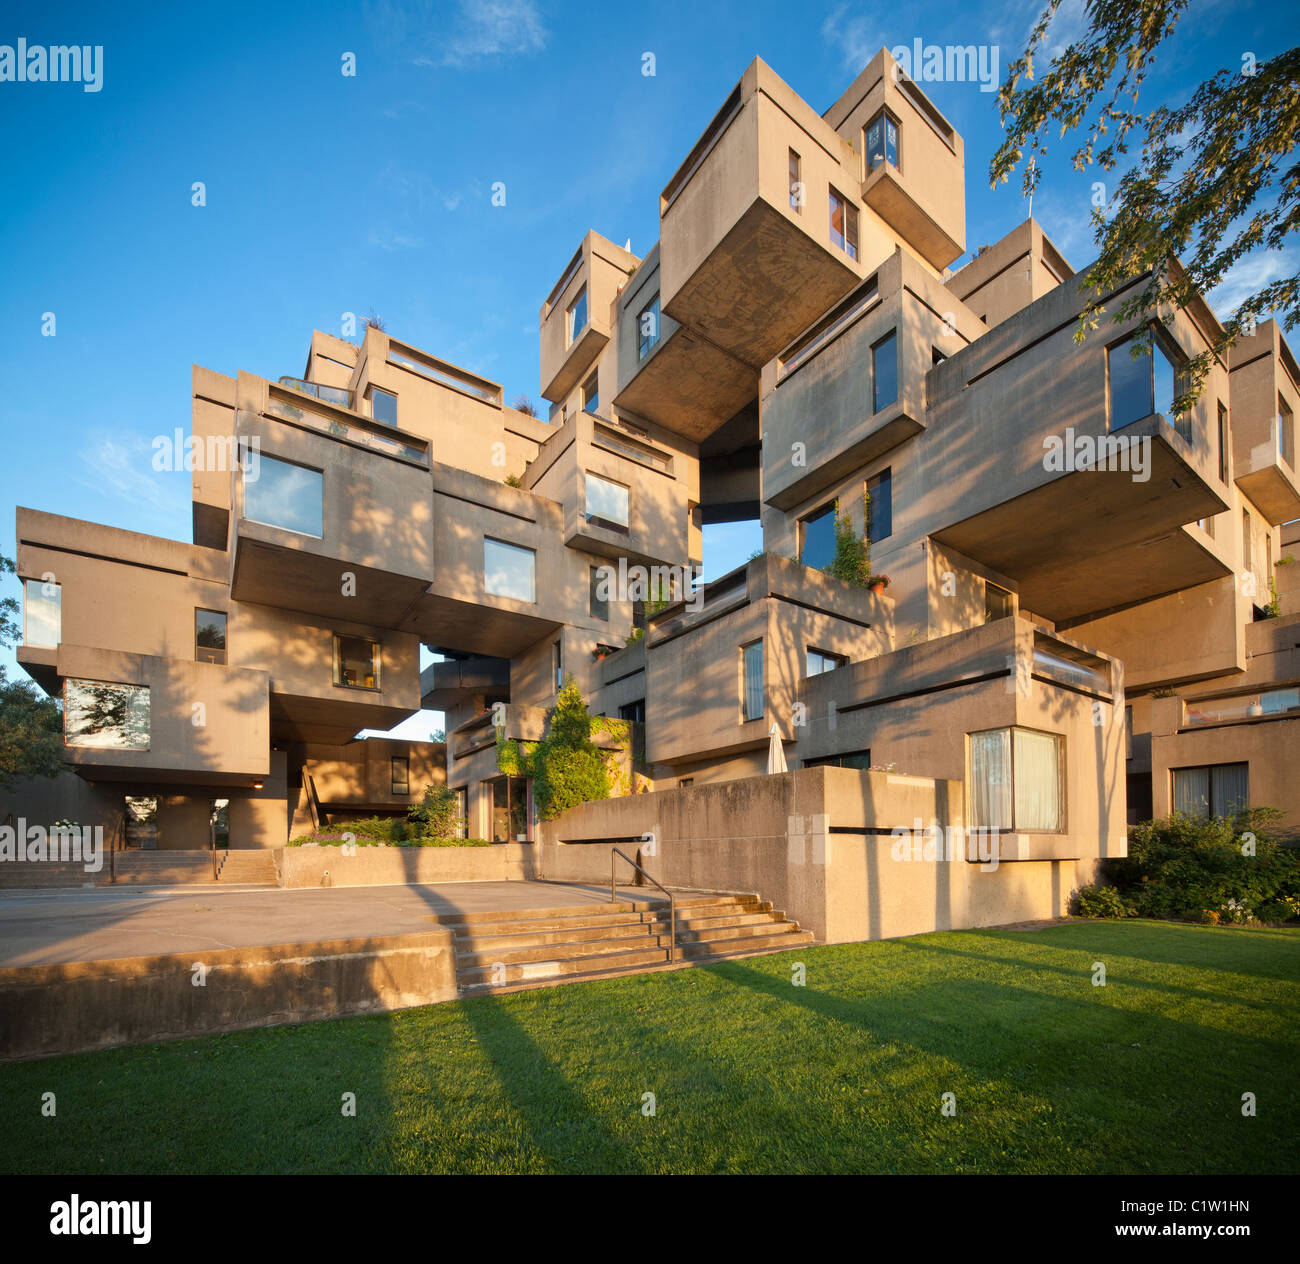 Canadian Apartments: Habitat 67 Housing Buildings At Montreal, Quebec, Canada